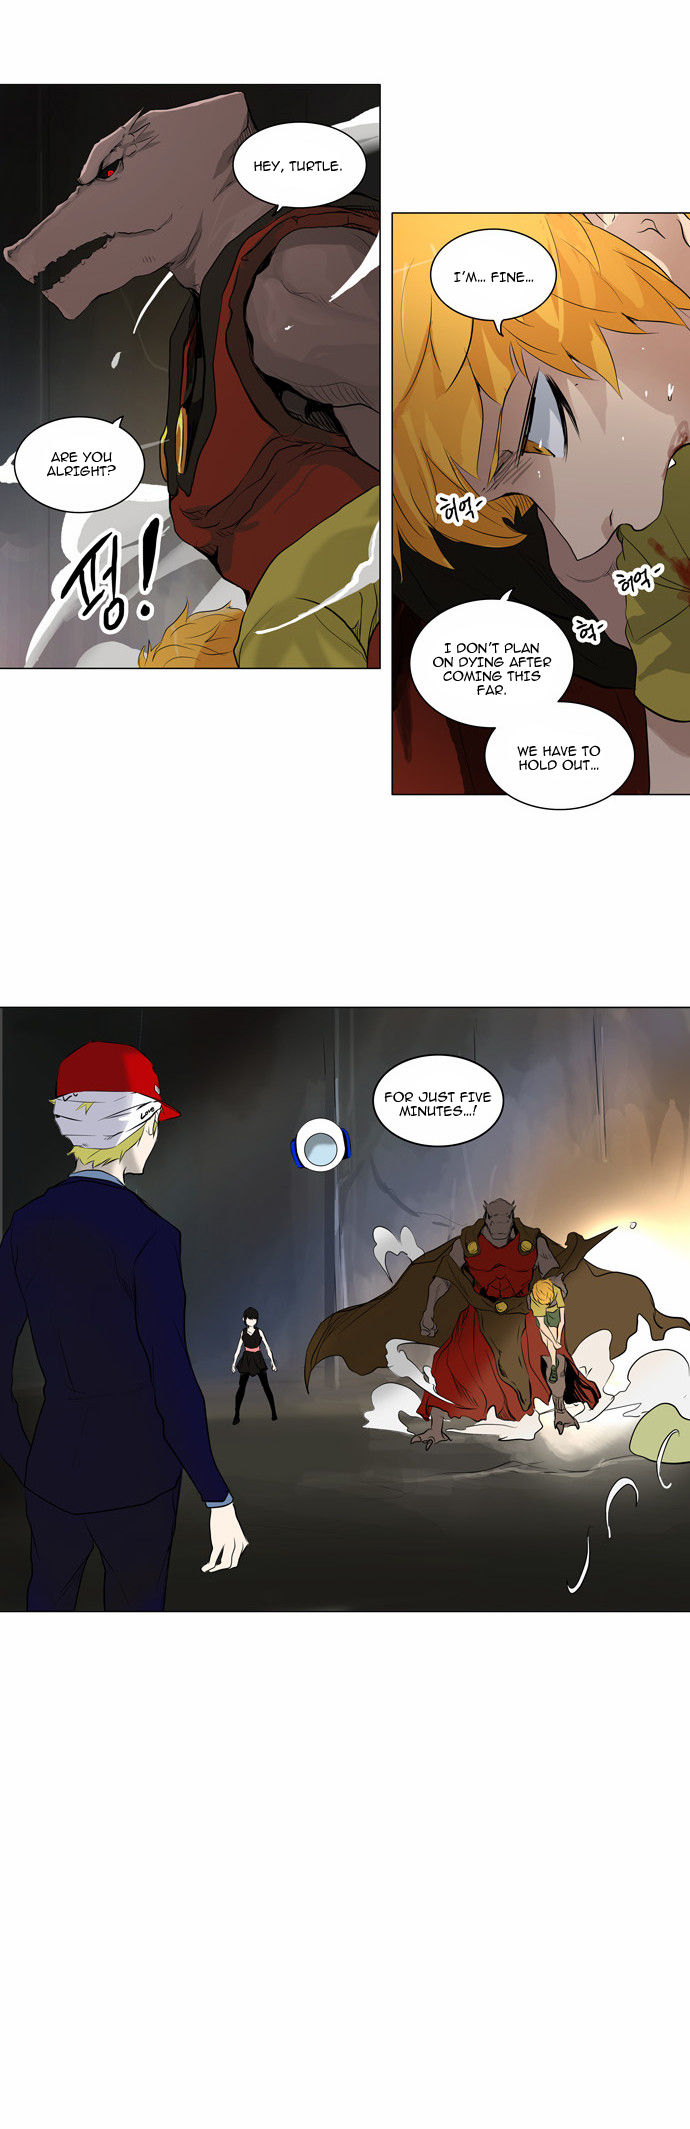 Tower of God  Season 2 94 Page 2